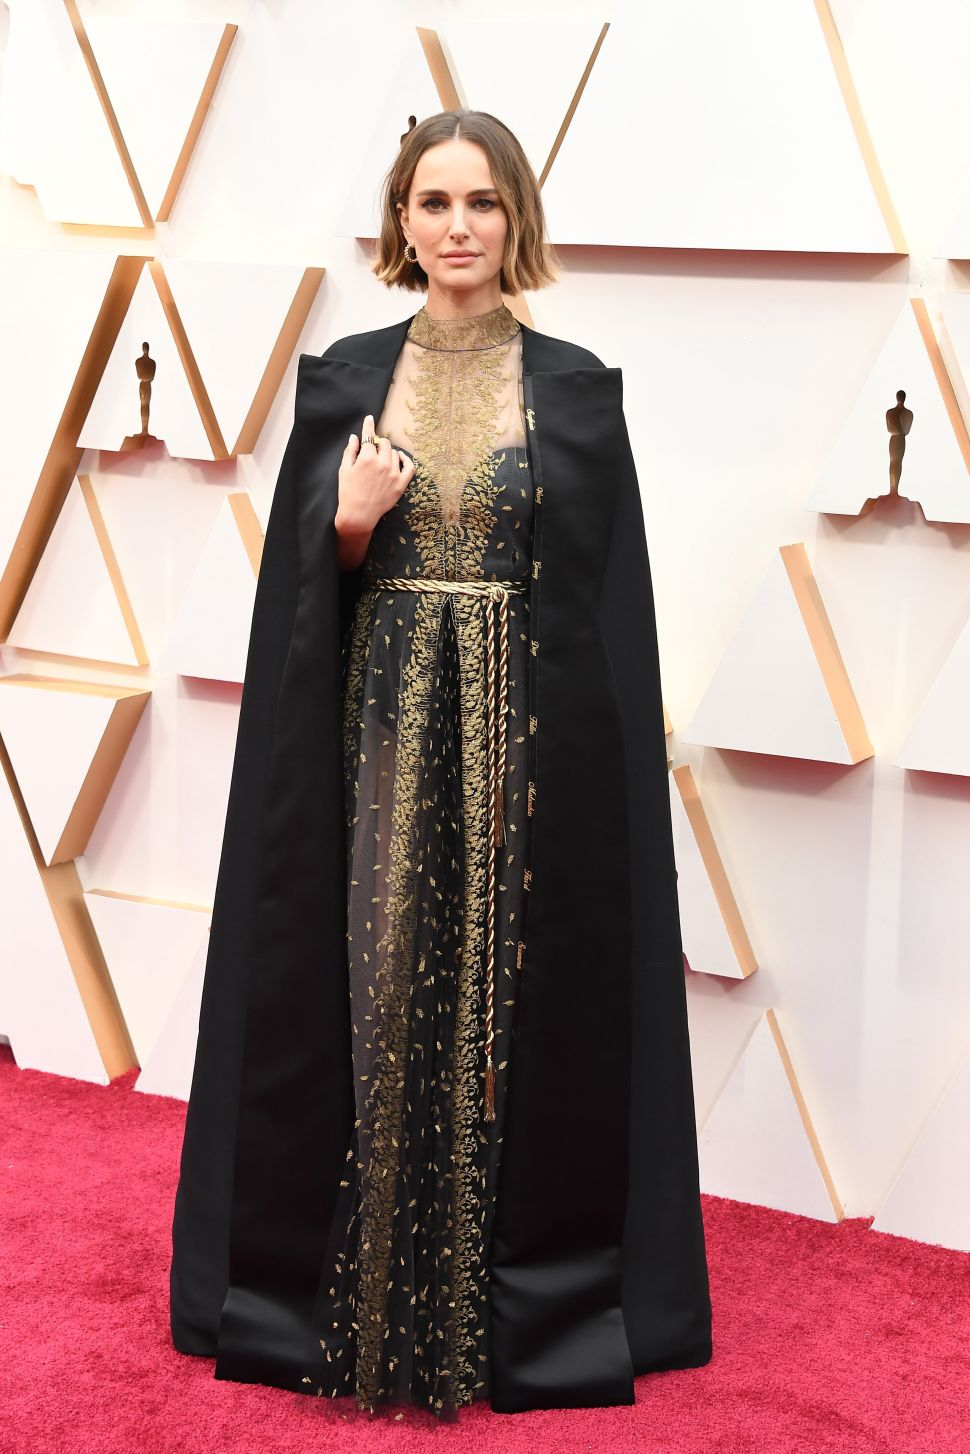 Natalie Portman's Dress Highlighted Women Shut Out of the Oscars